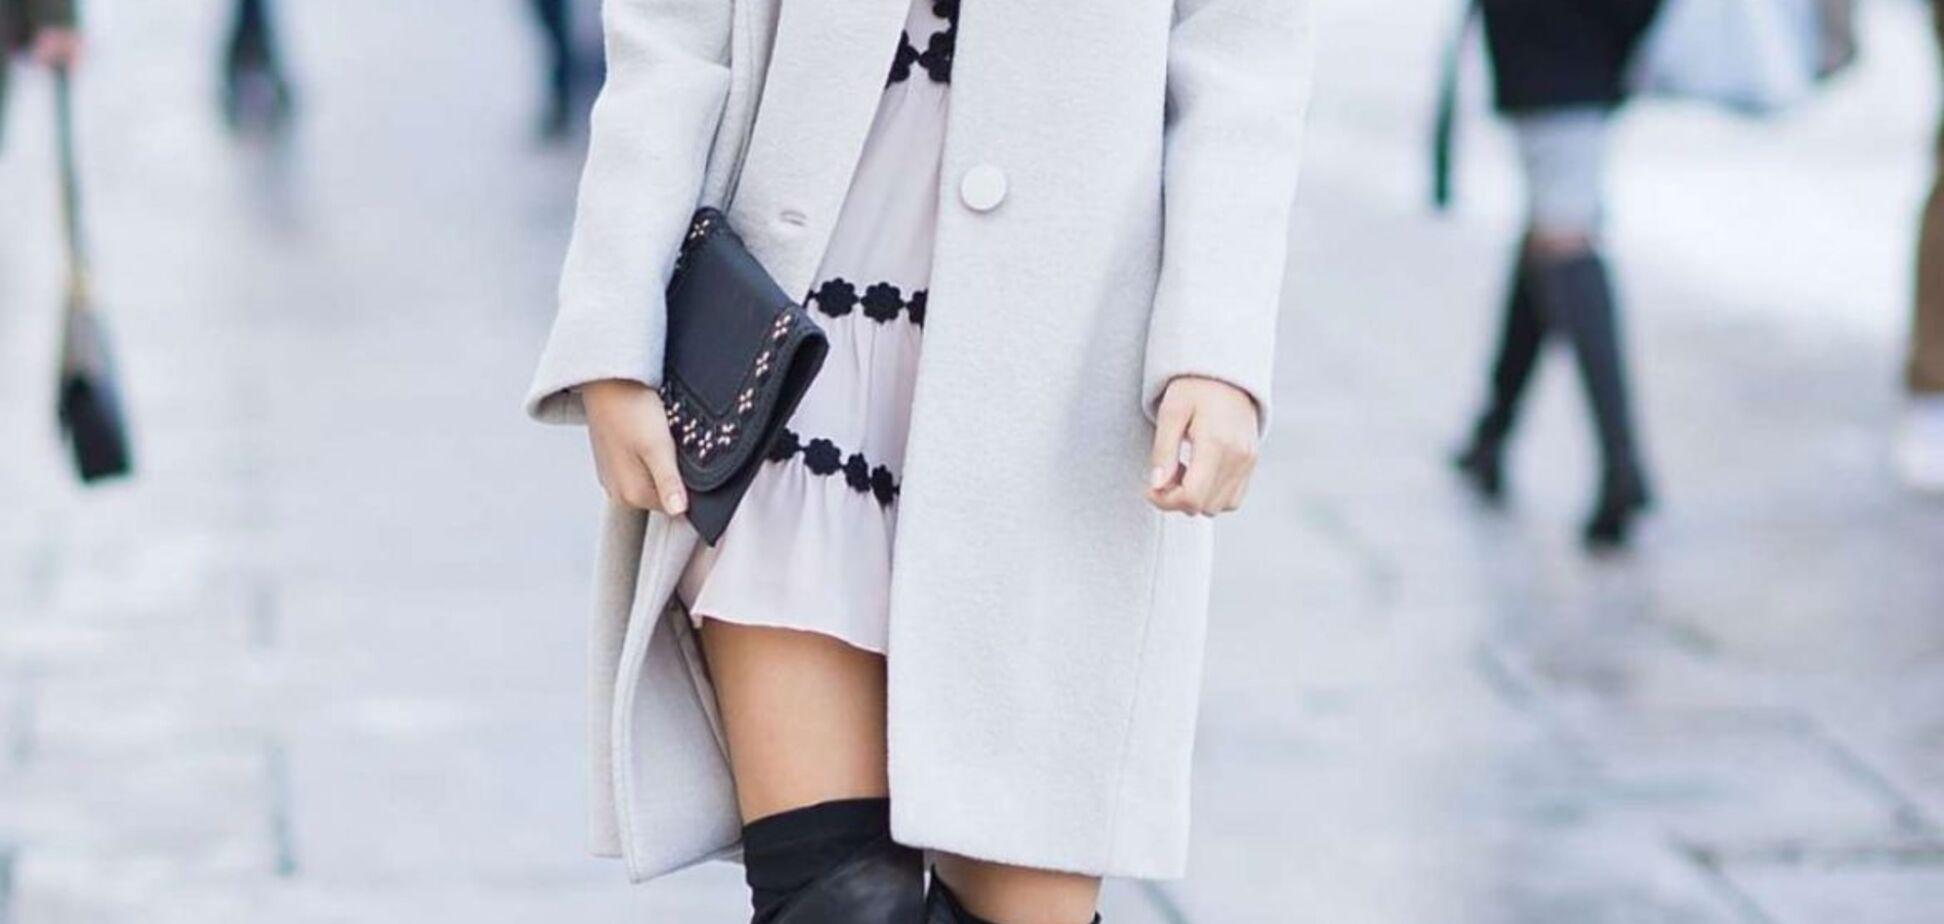 Хто купує біле пальто?